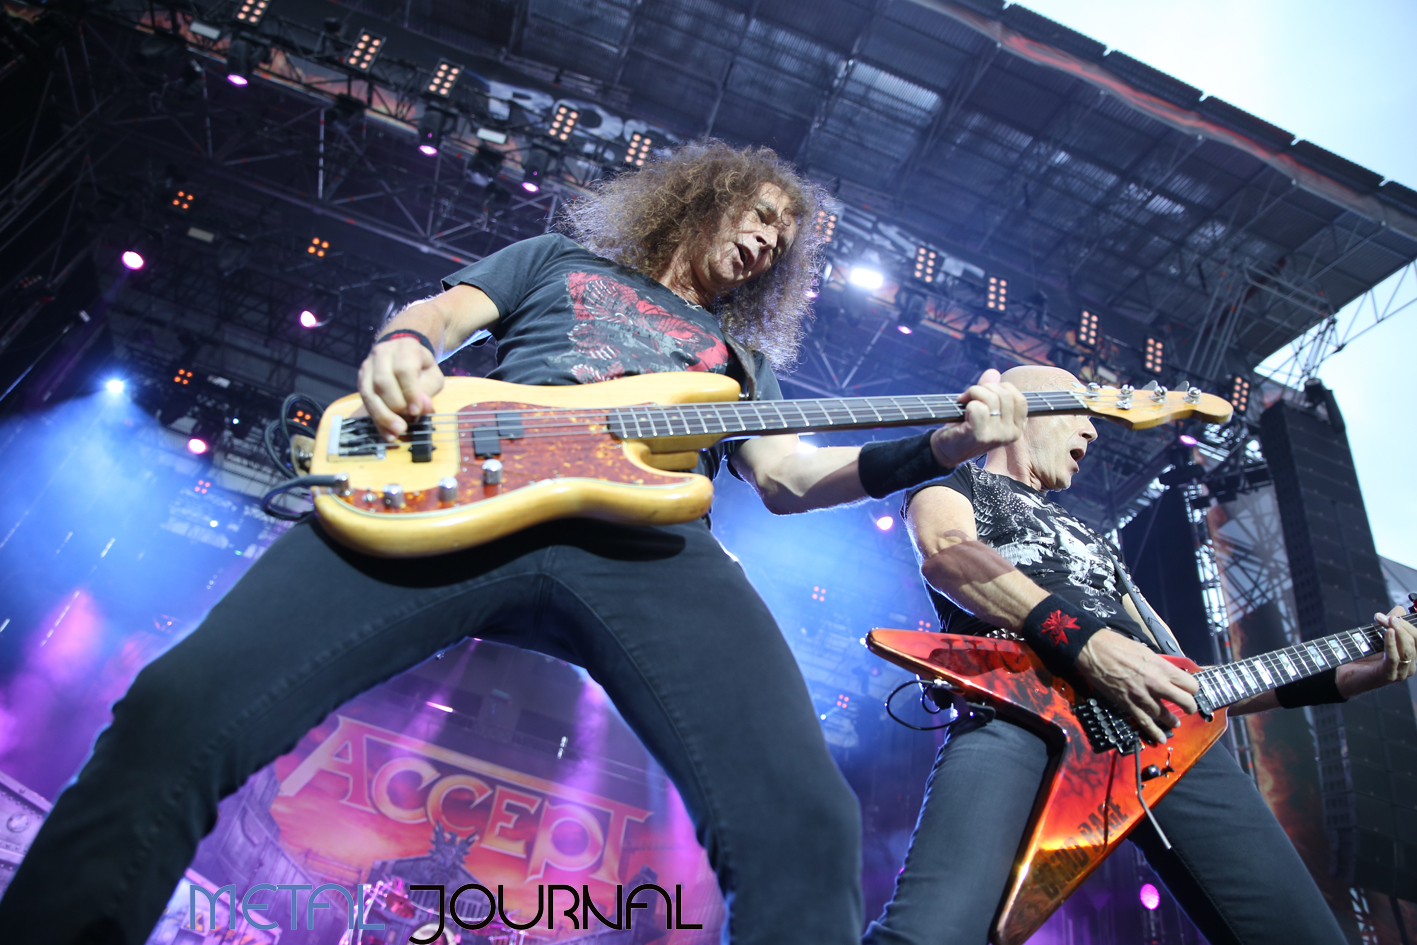 accept rock fest 18 - metal journal pic 6